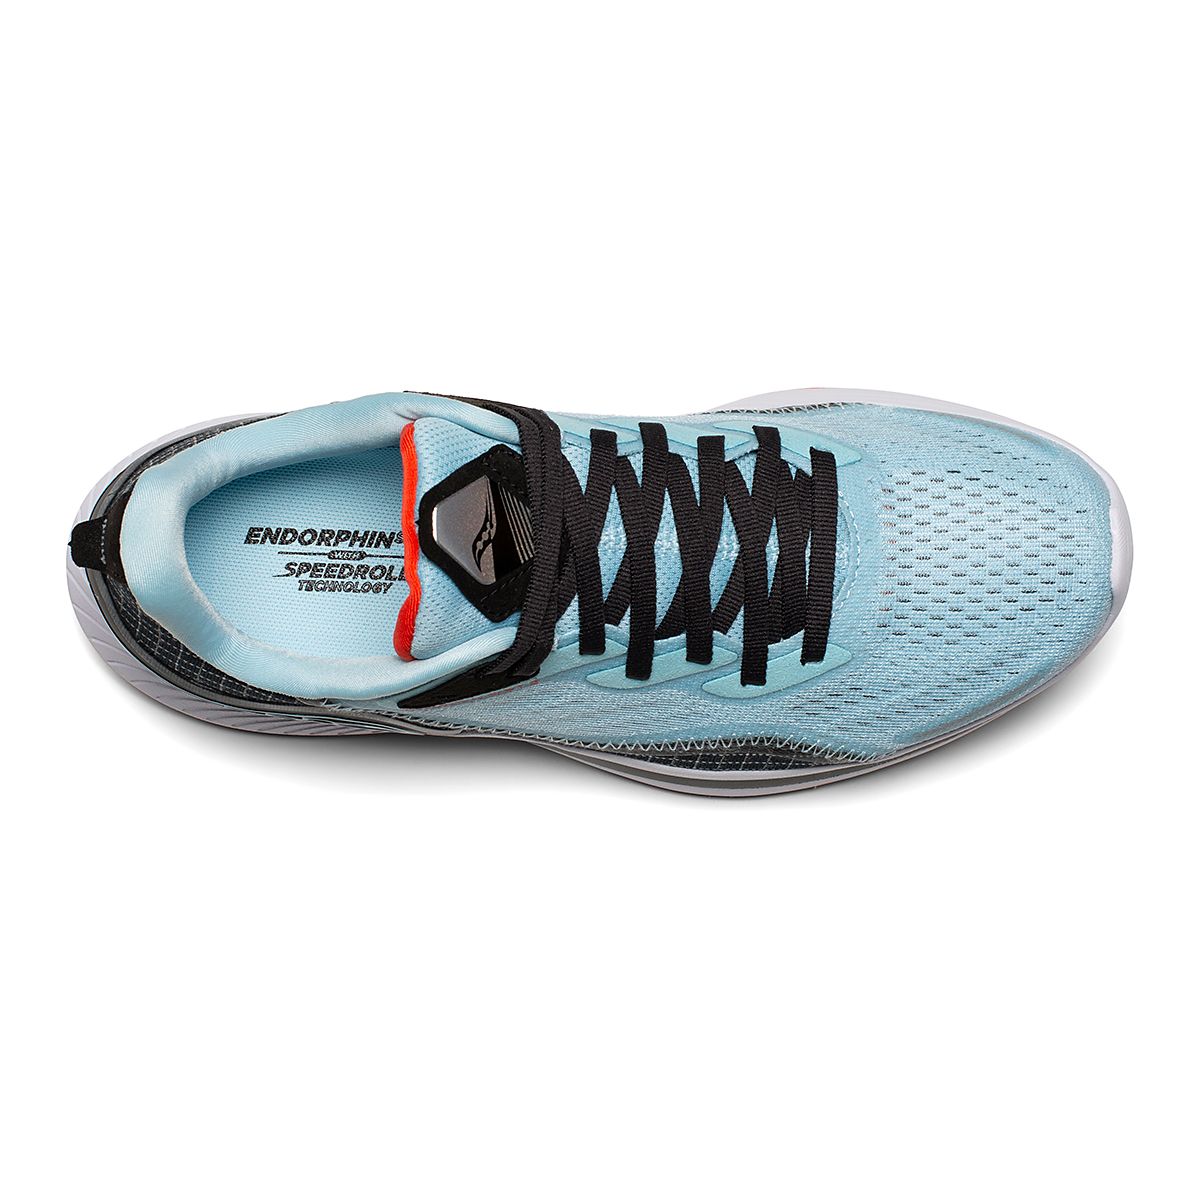 Women's Saucony Endorphin Shift 2 Running Shoe - Color: Powder/Scarlet - Size: 5 - Width: Regular, Powder/Scarlet, large, image 3